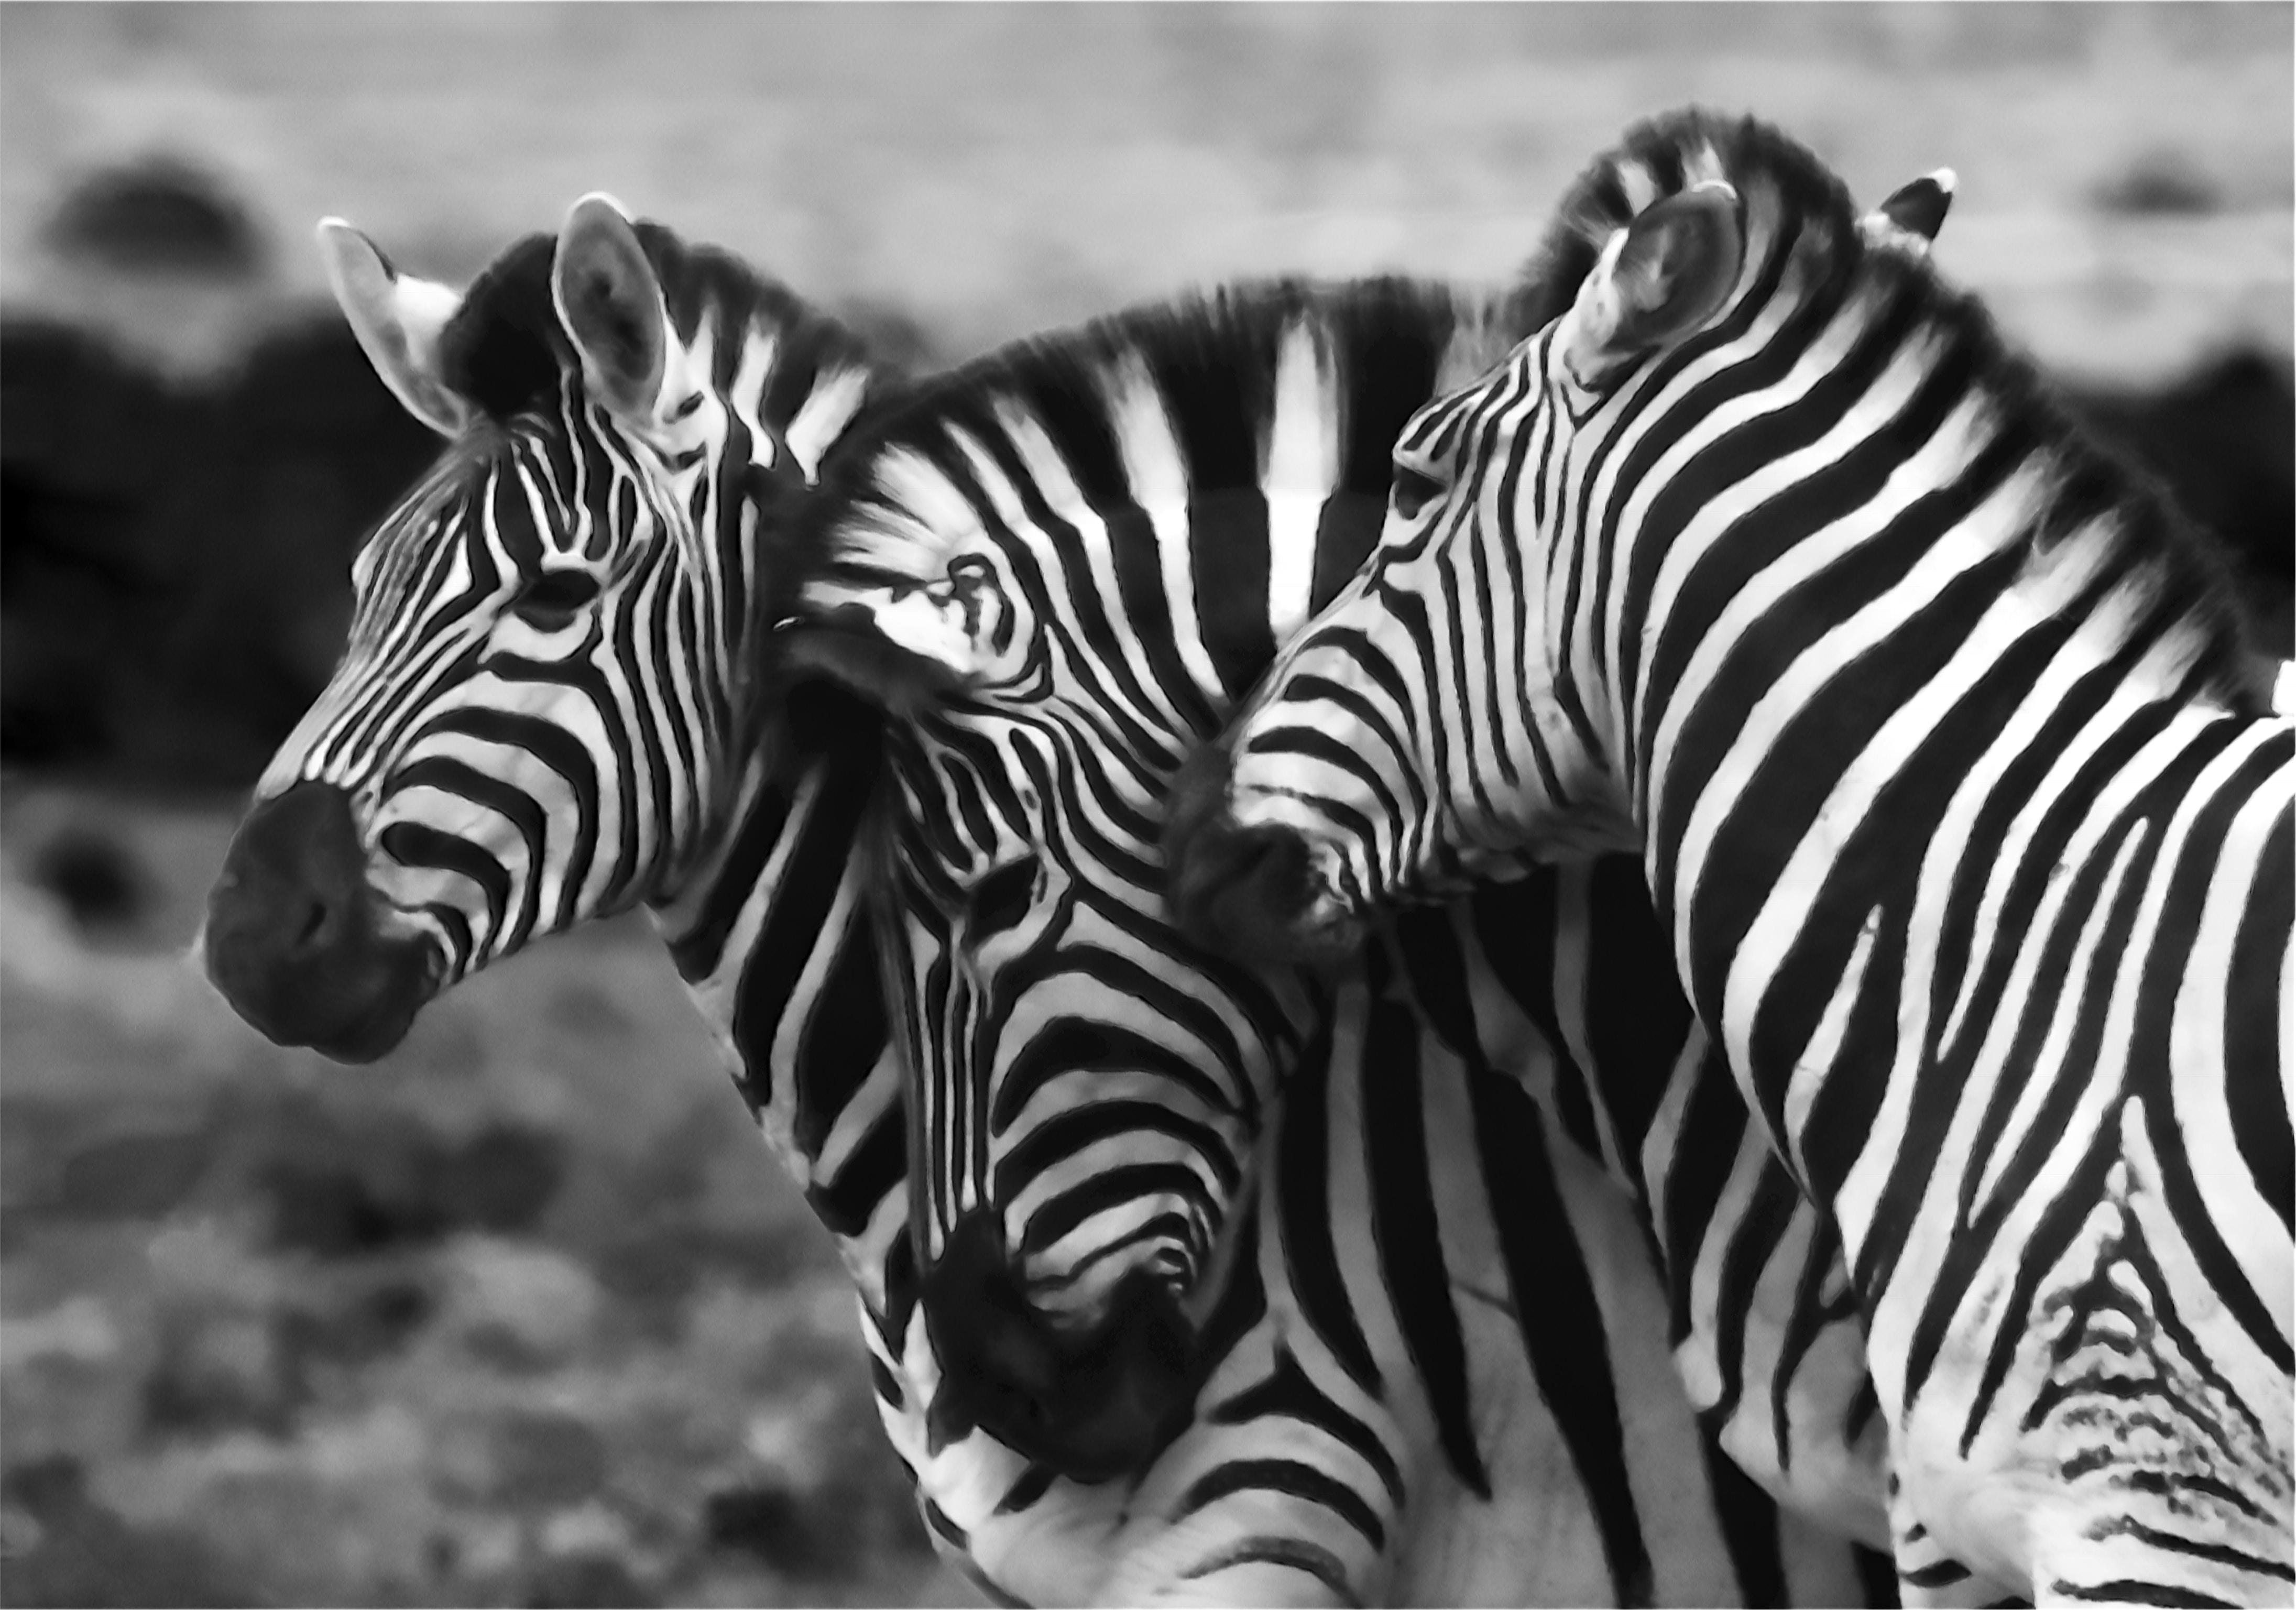 grayscale photo of three zebra